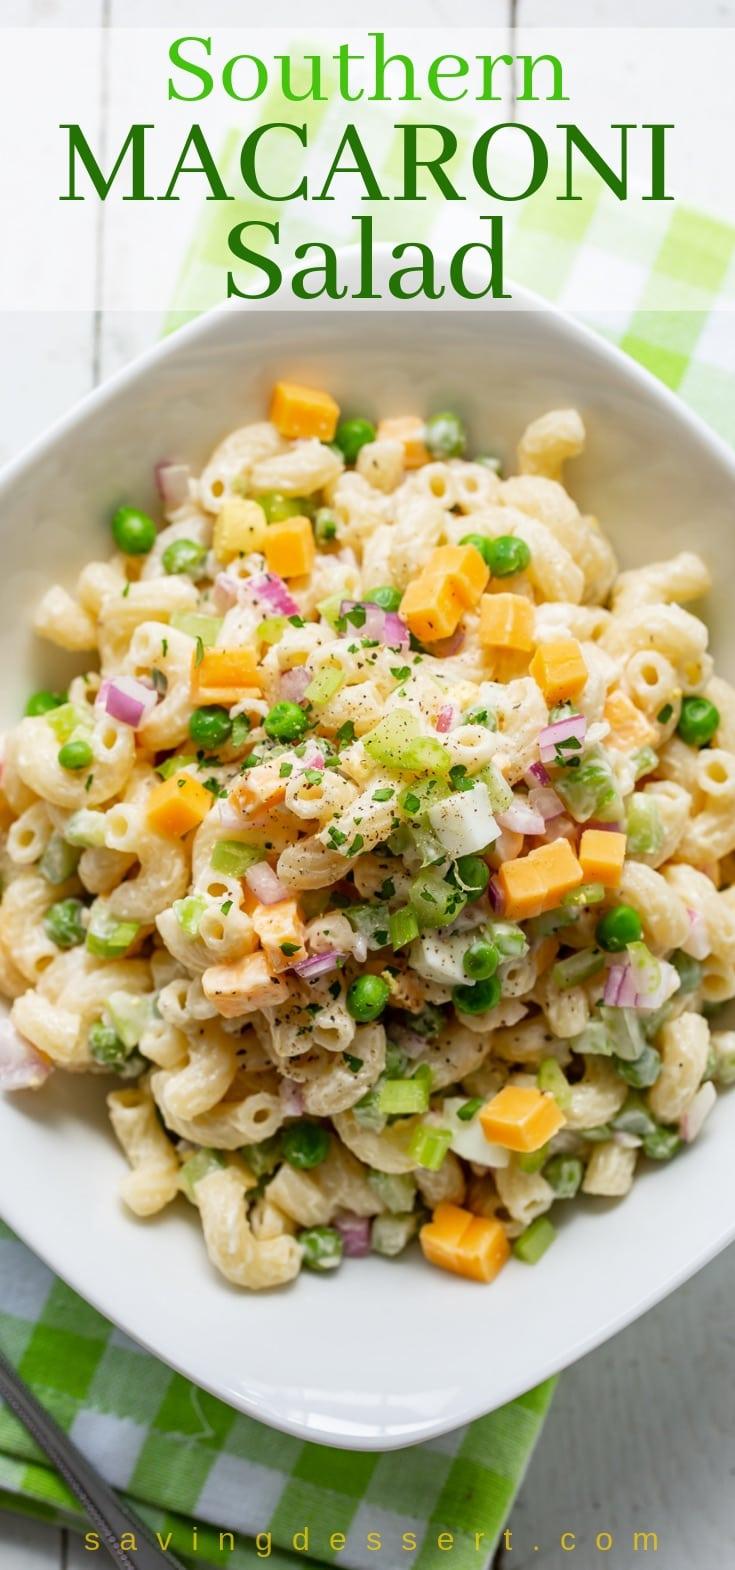 Southern Macaroni Salad from savingdessert.com